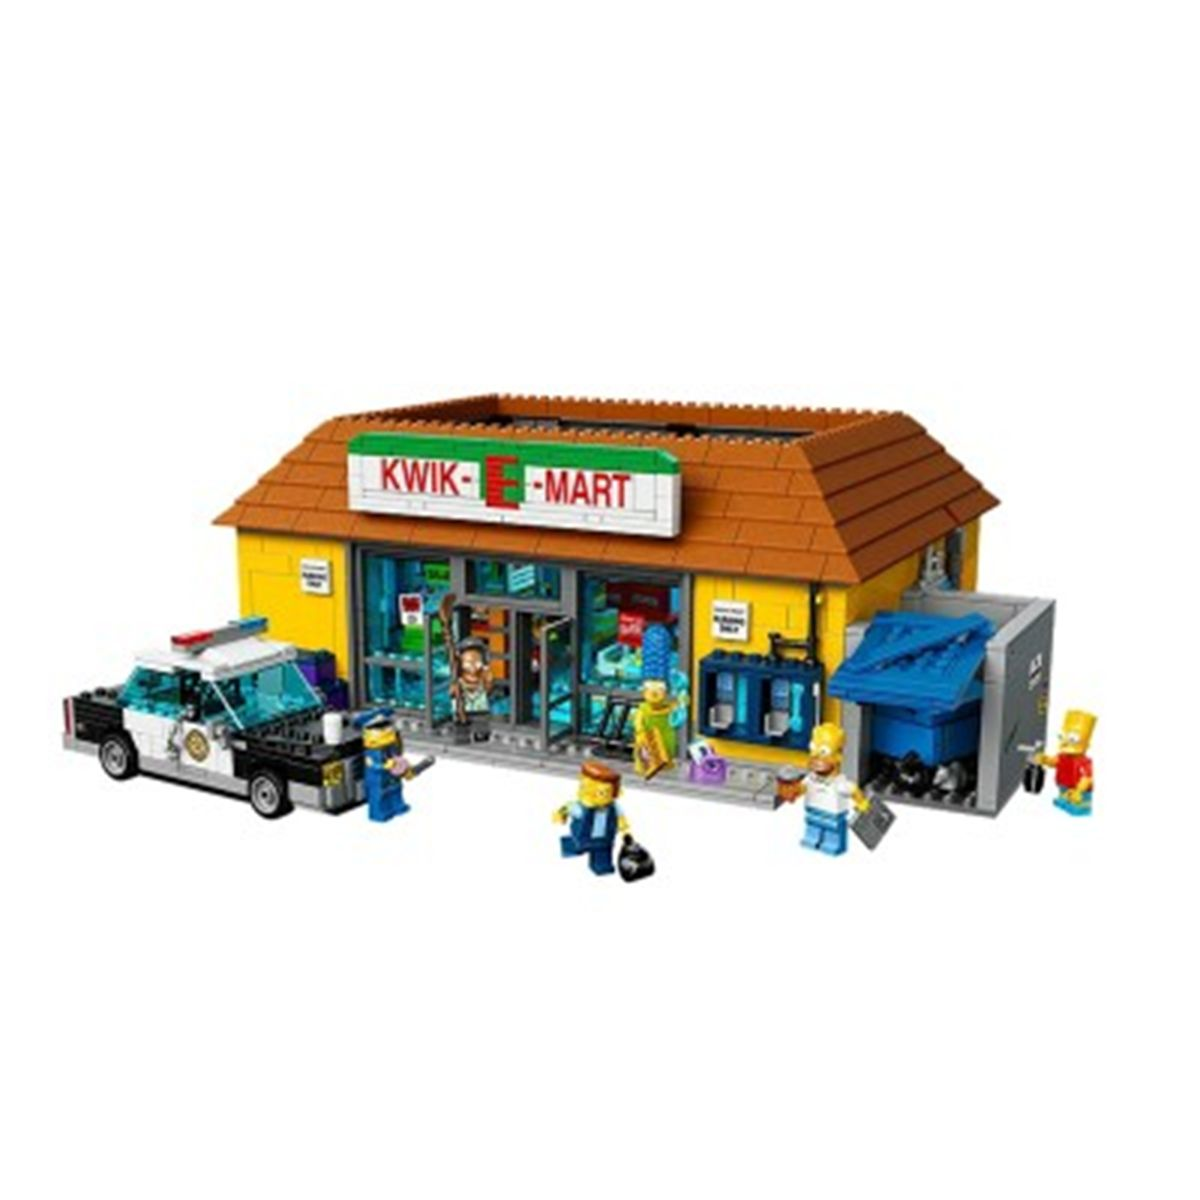 Les Kwik Mark 71016 HérosCinéma Lego Super E Simpsons rCBEQWxoed